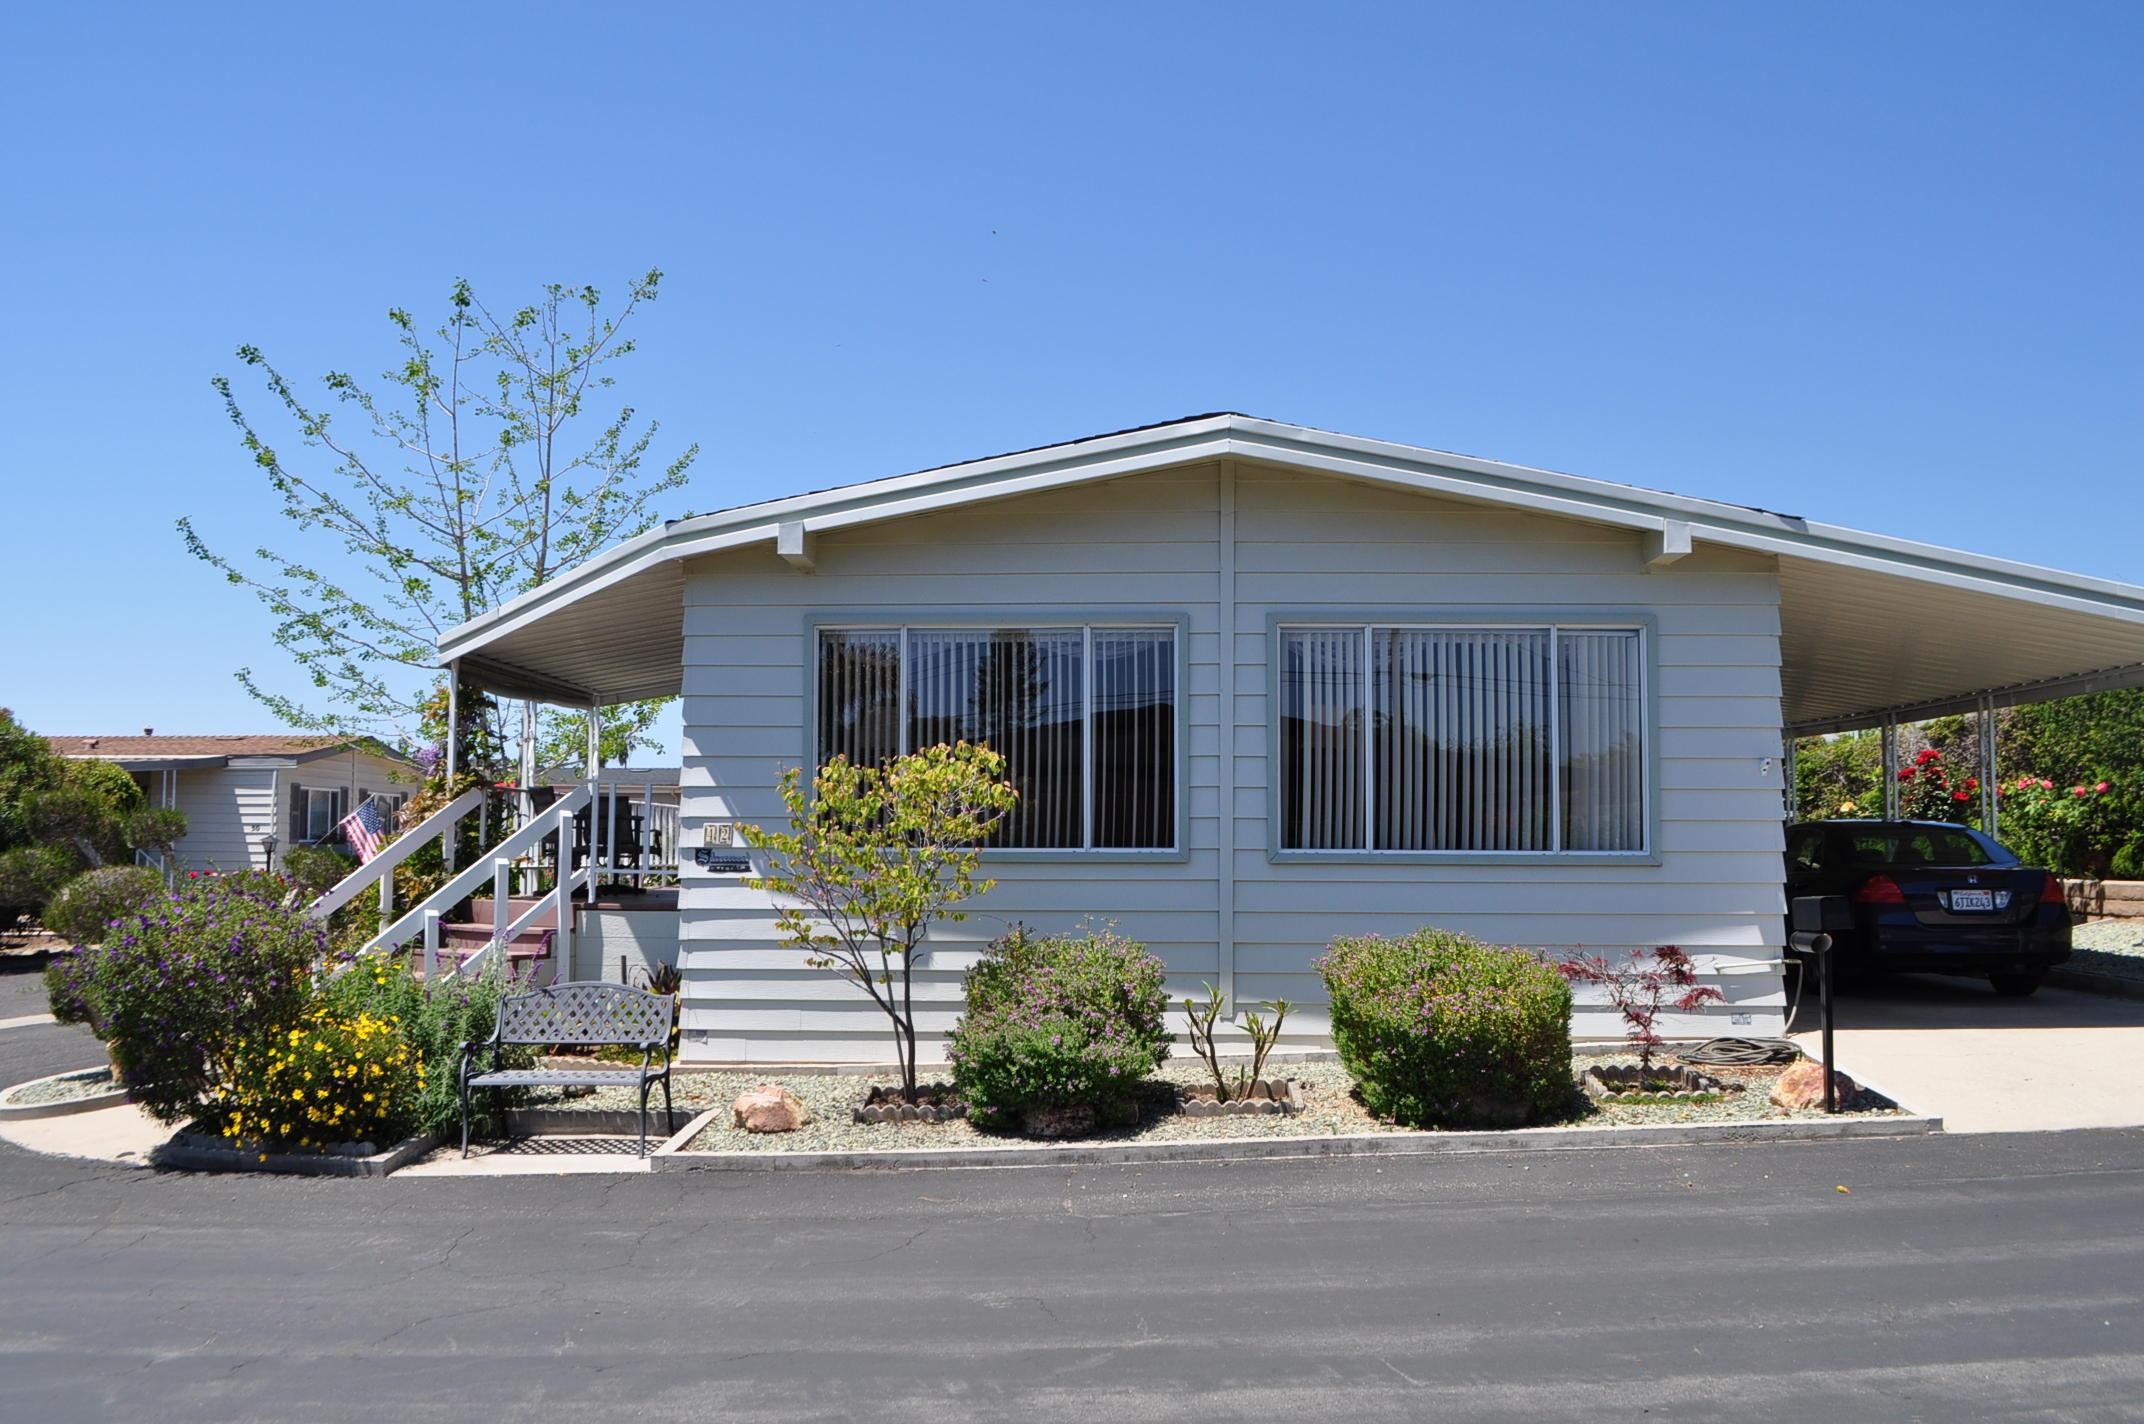 Property photo for 340 Old Mill Rd #42 Santa Barbara, California 93110 - 18-3599